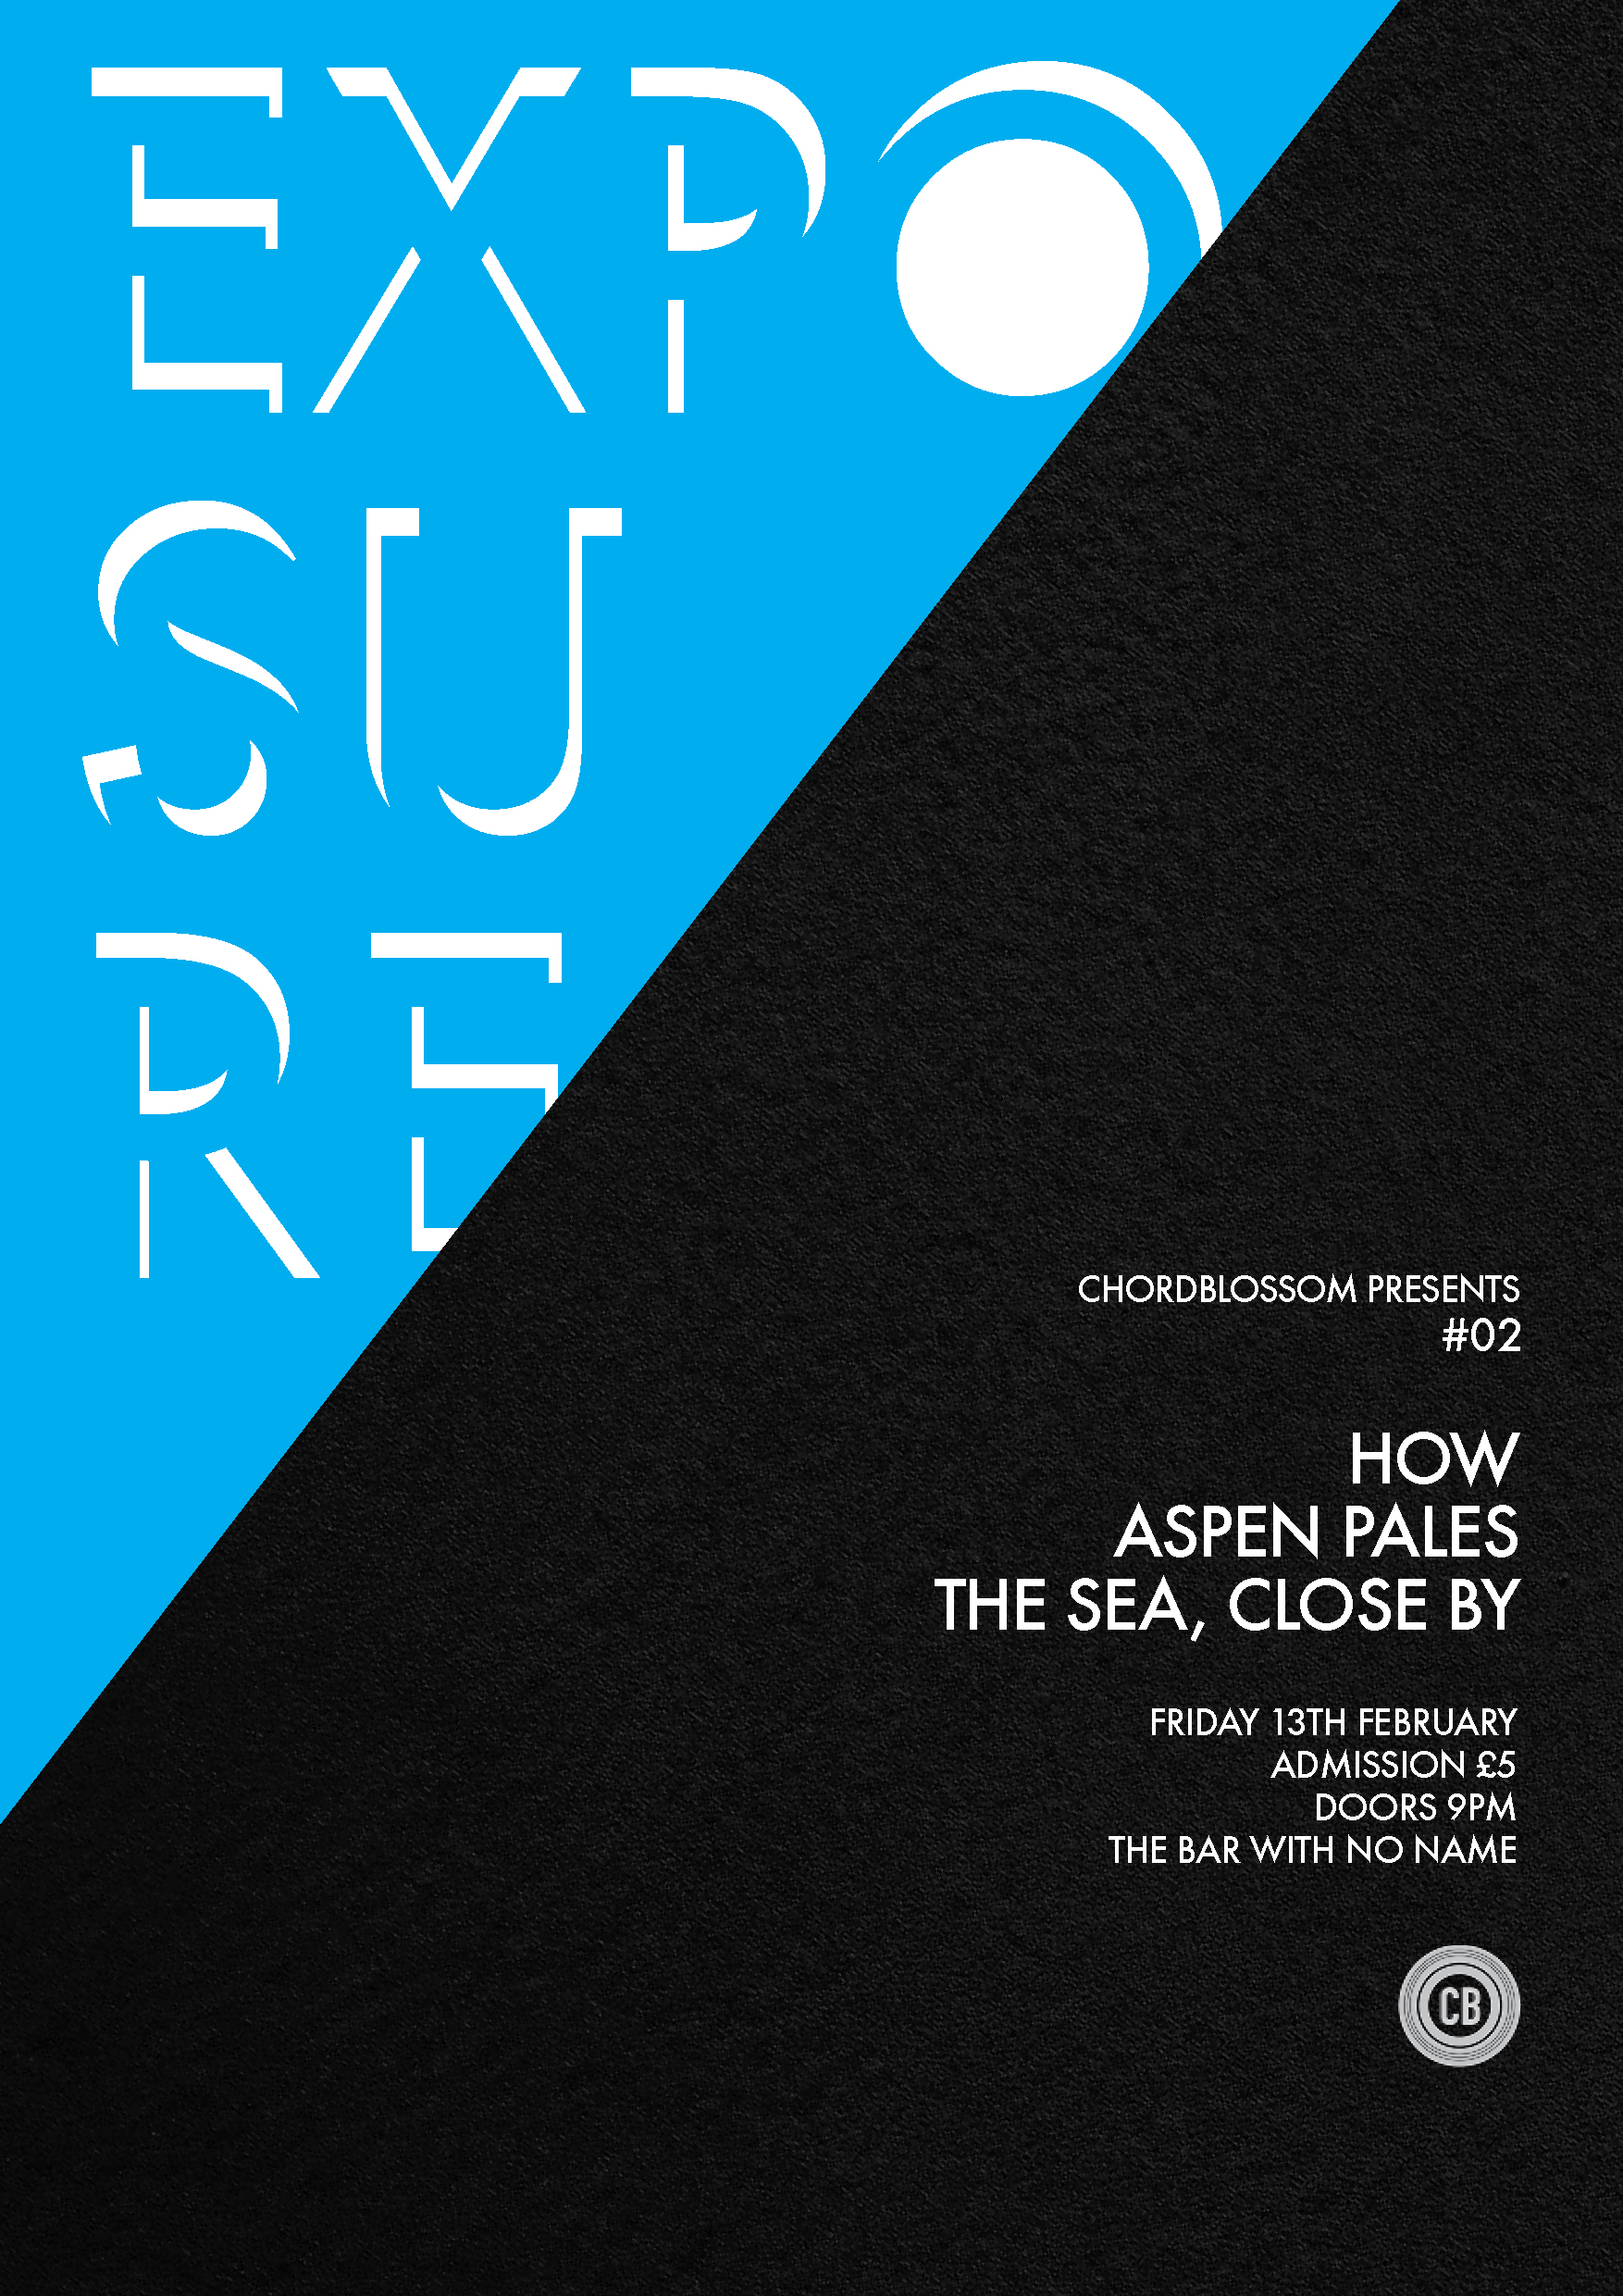 chordblossom exposure #02 gig poster